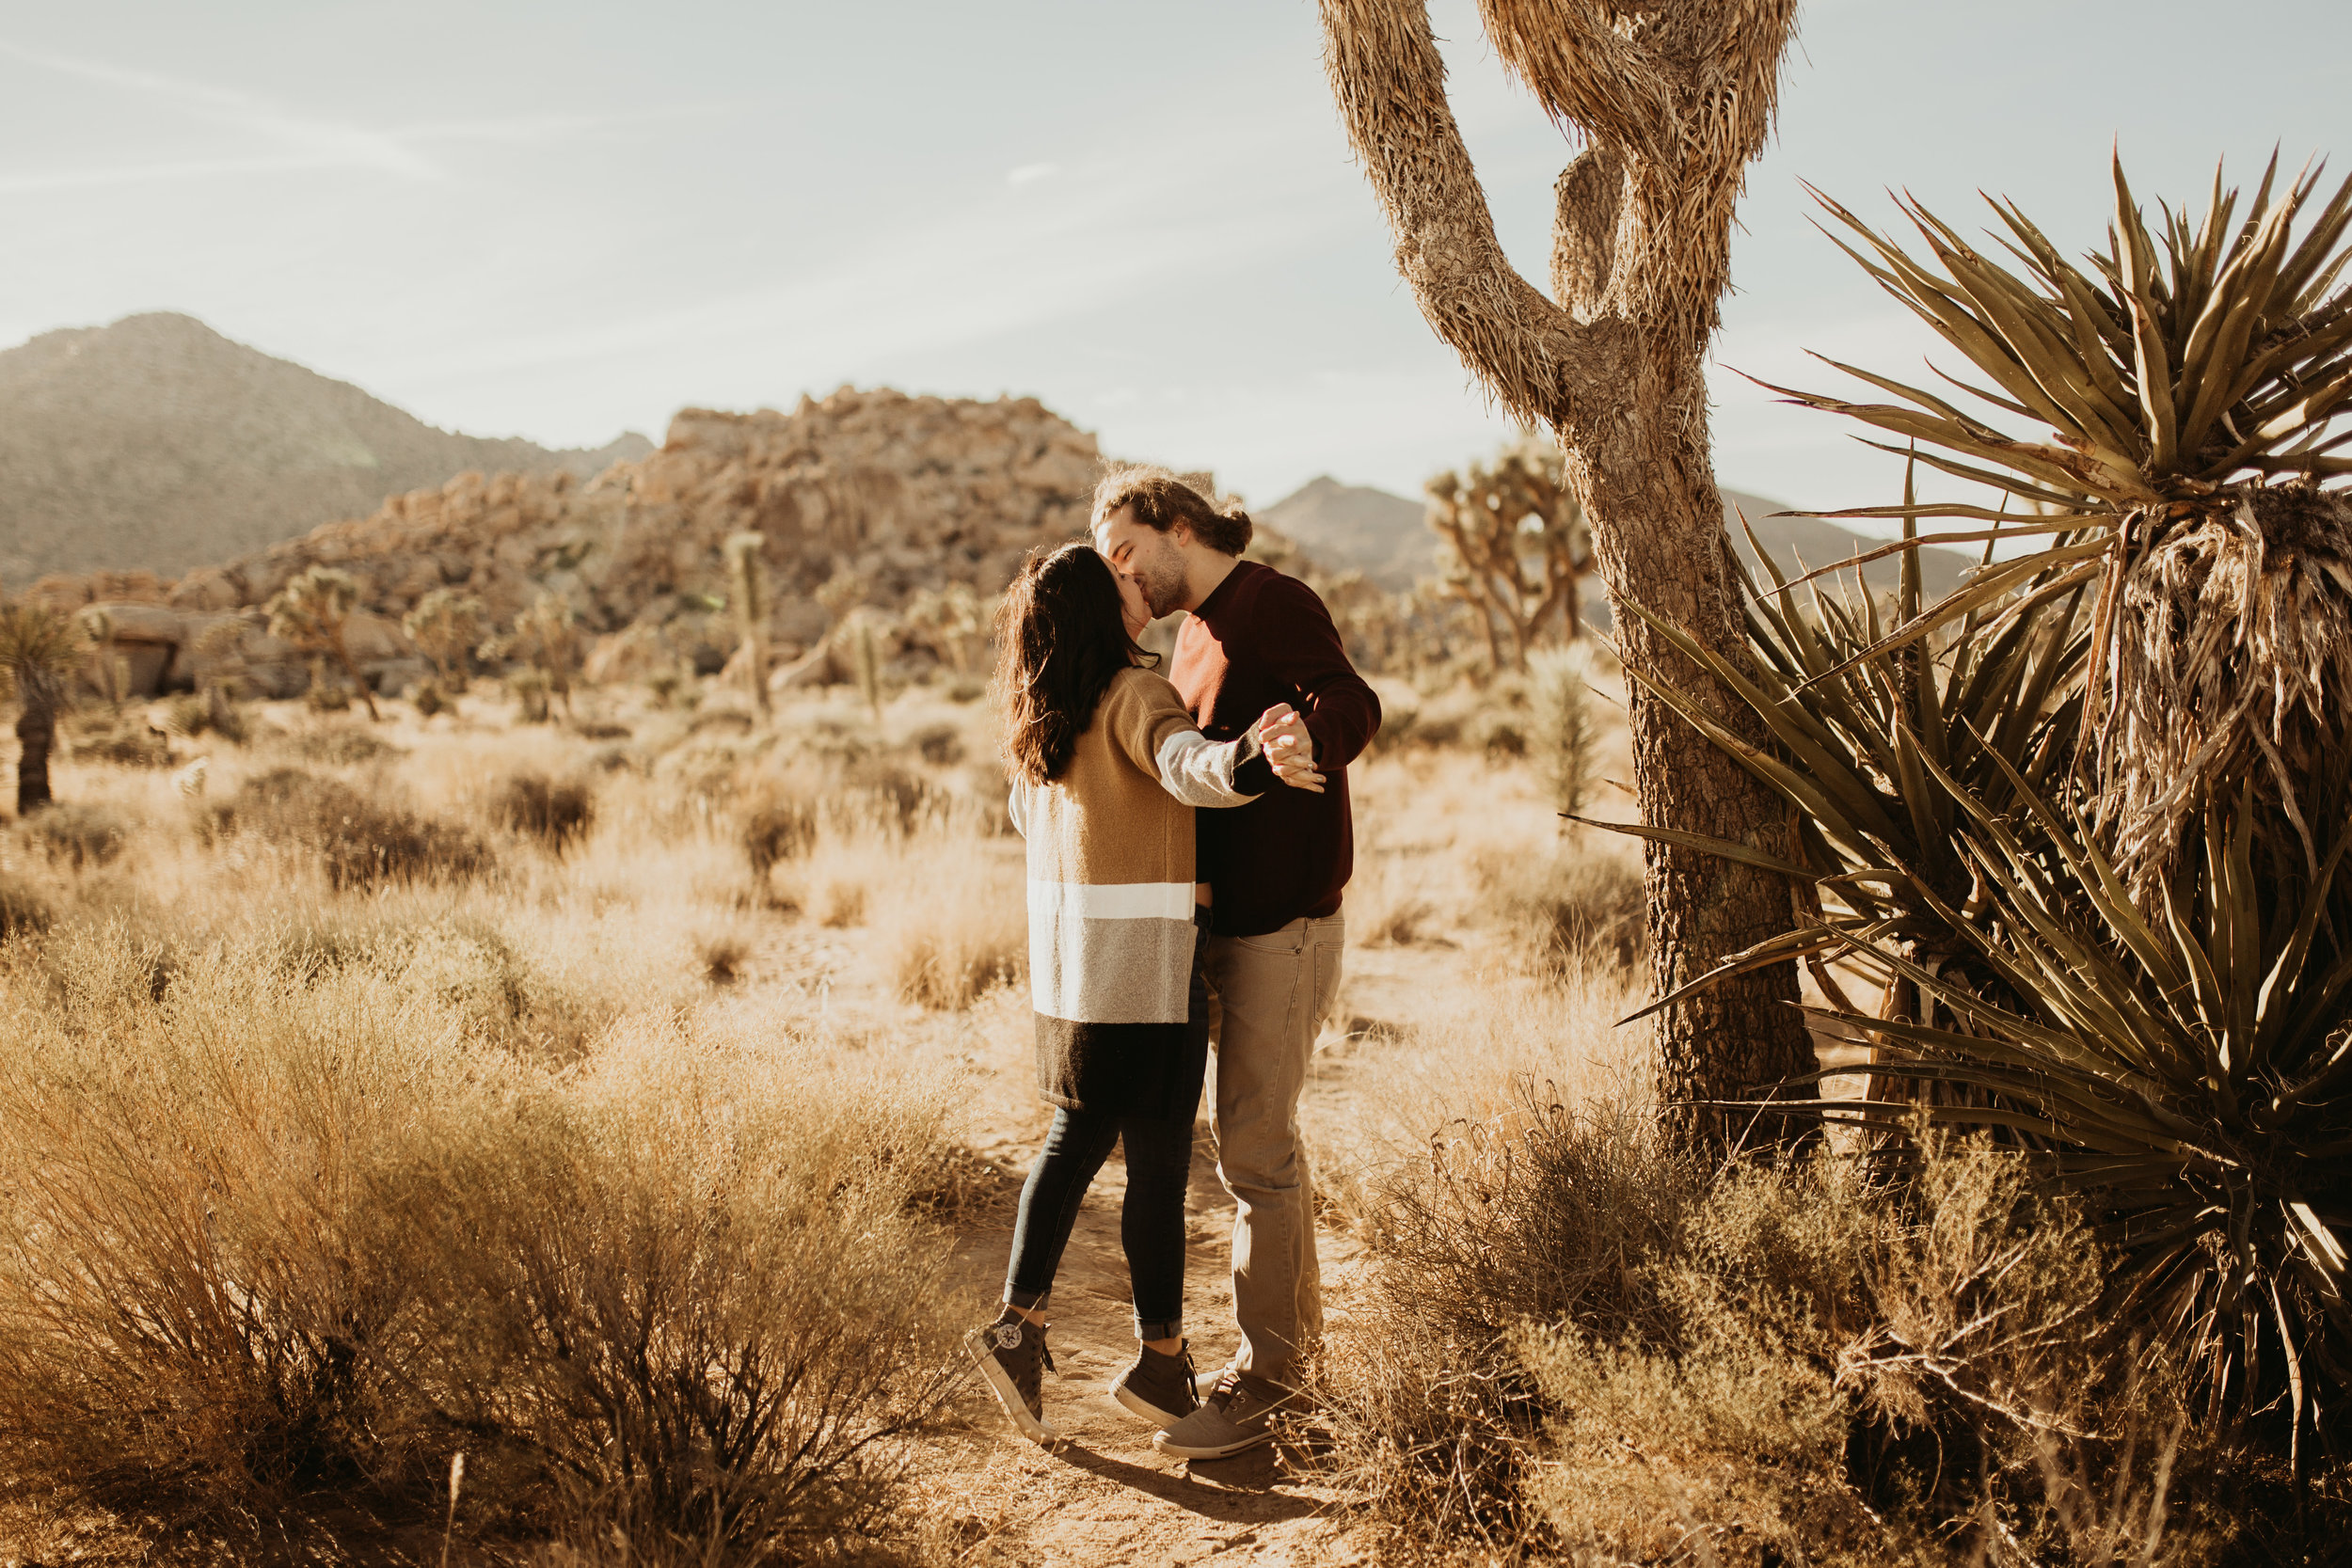 arizona+california+joshuatree+palmsprings+wedding+photographer03.jpg